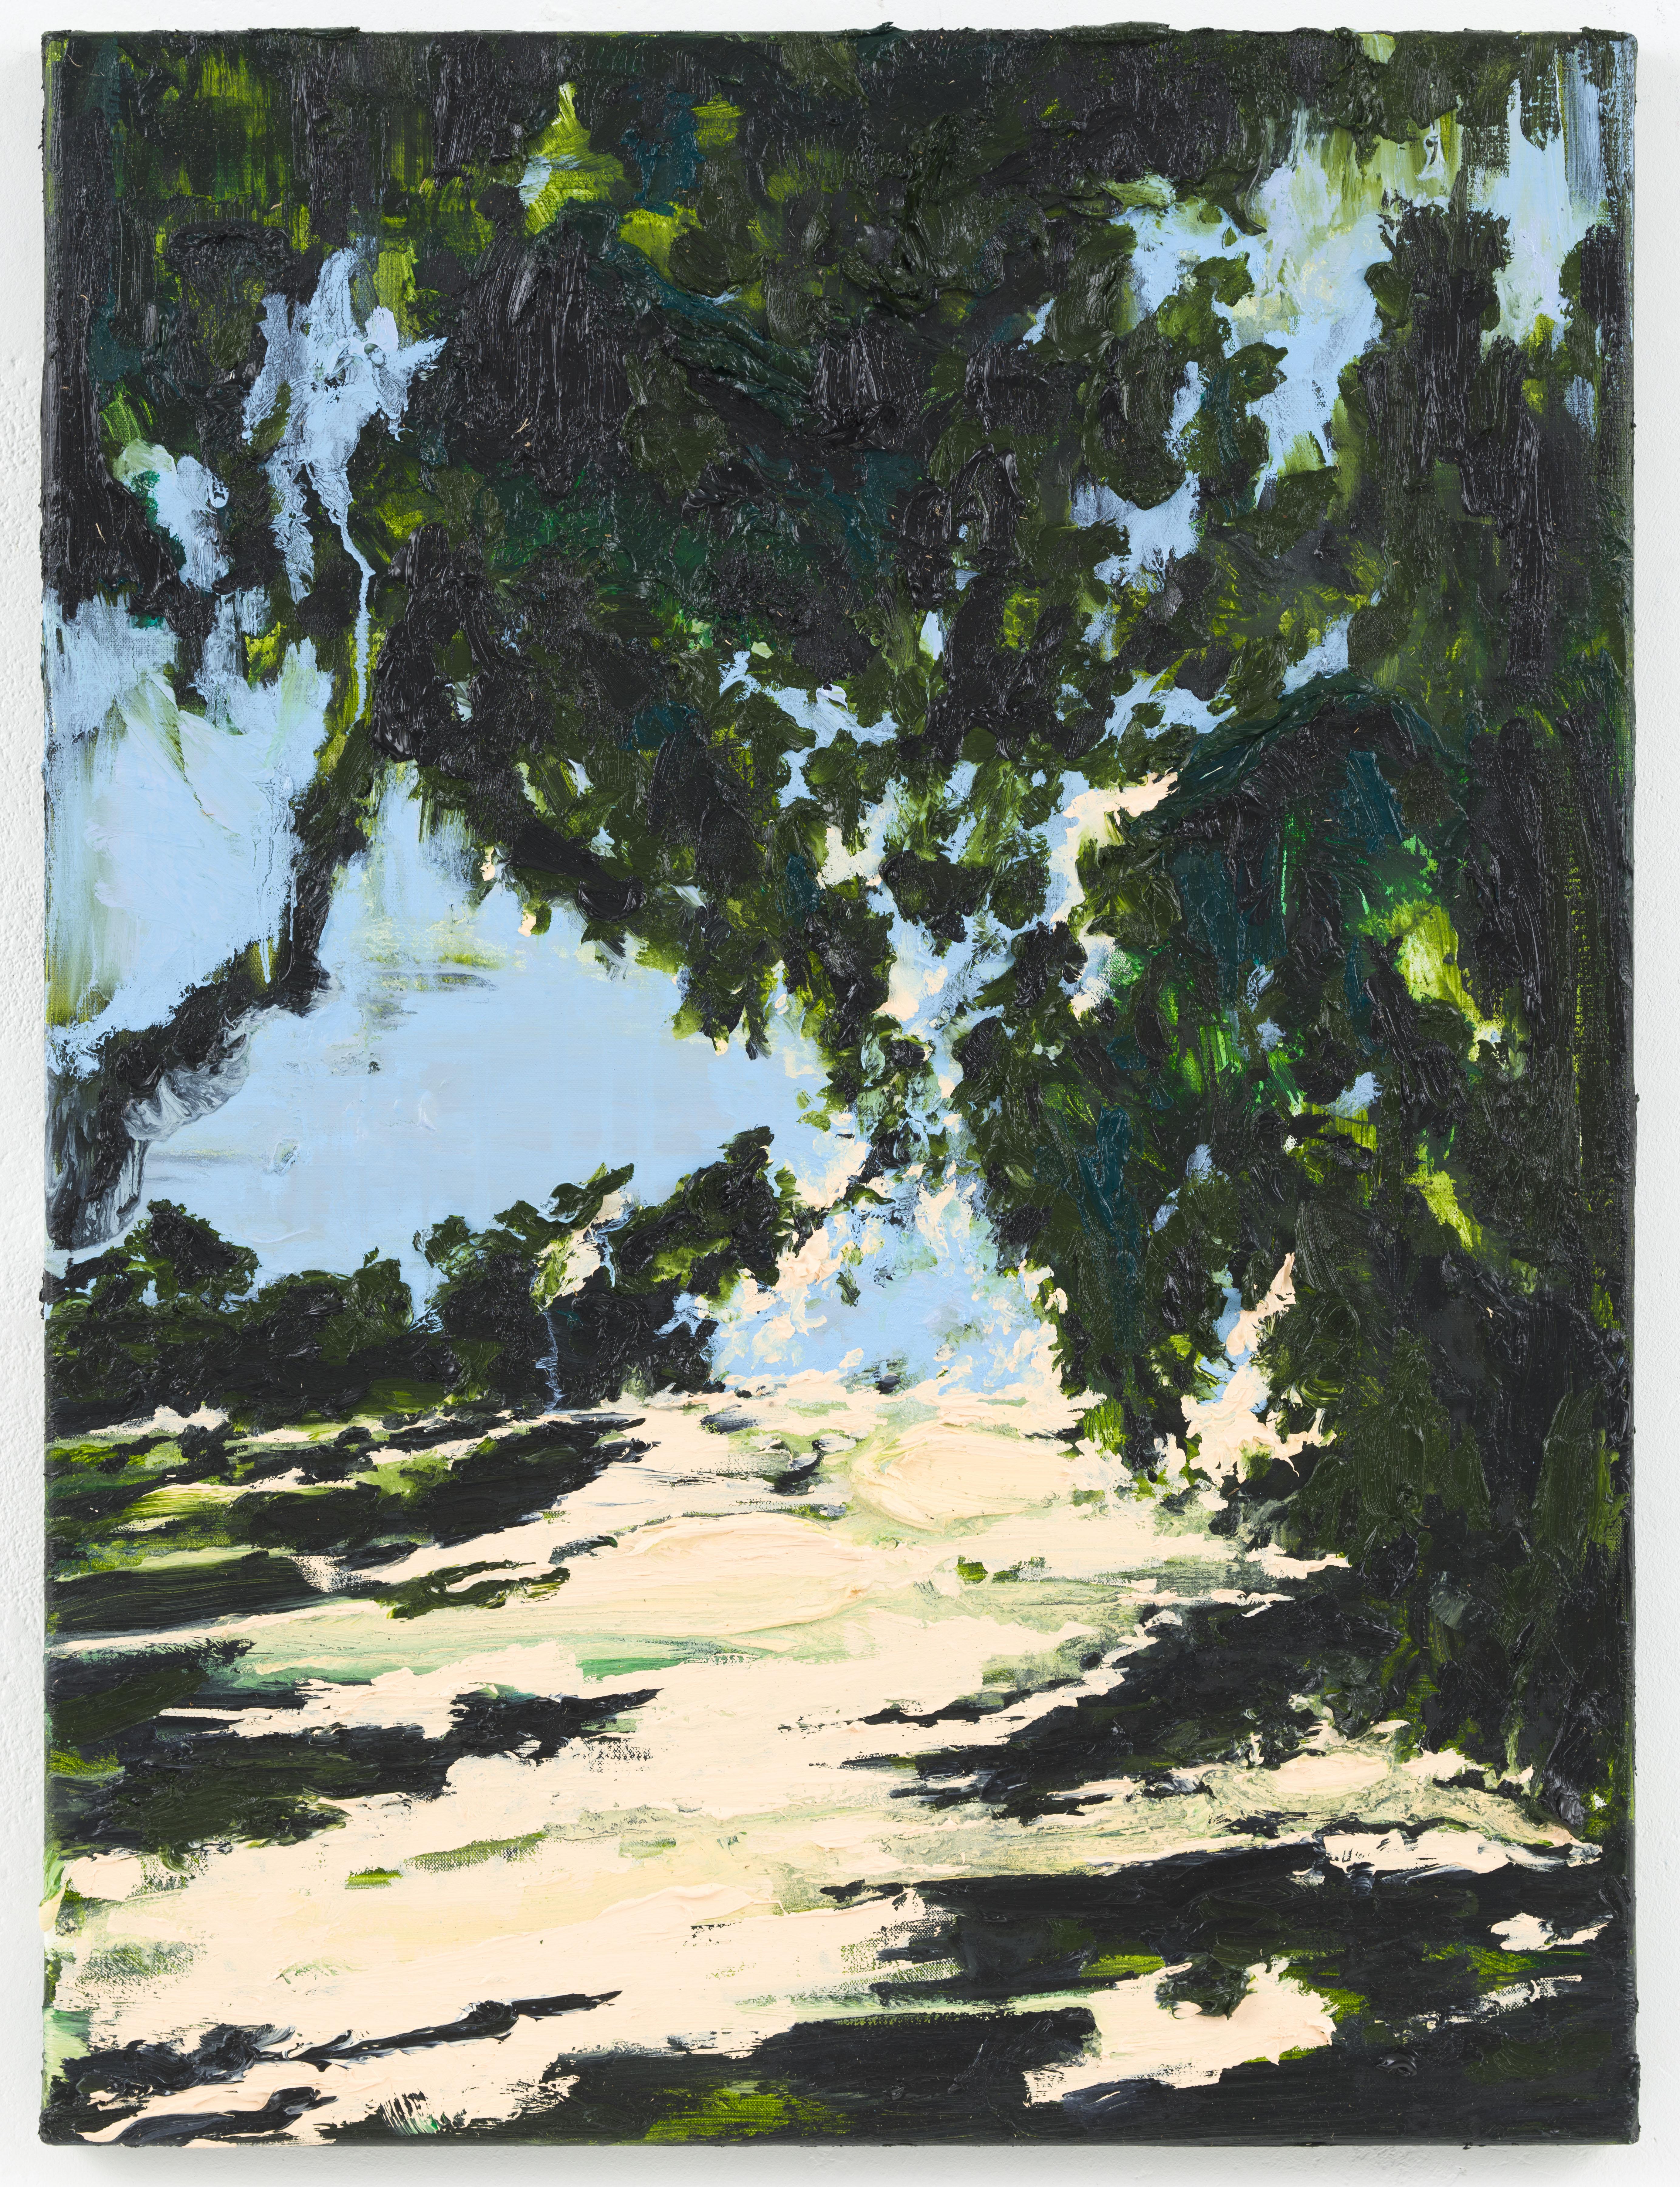 """Vagando"" 80 x 60 cm.oil on linen 2012"